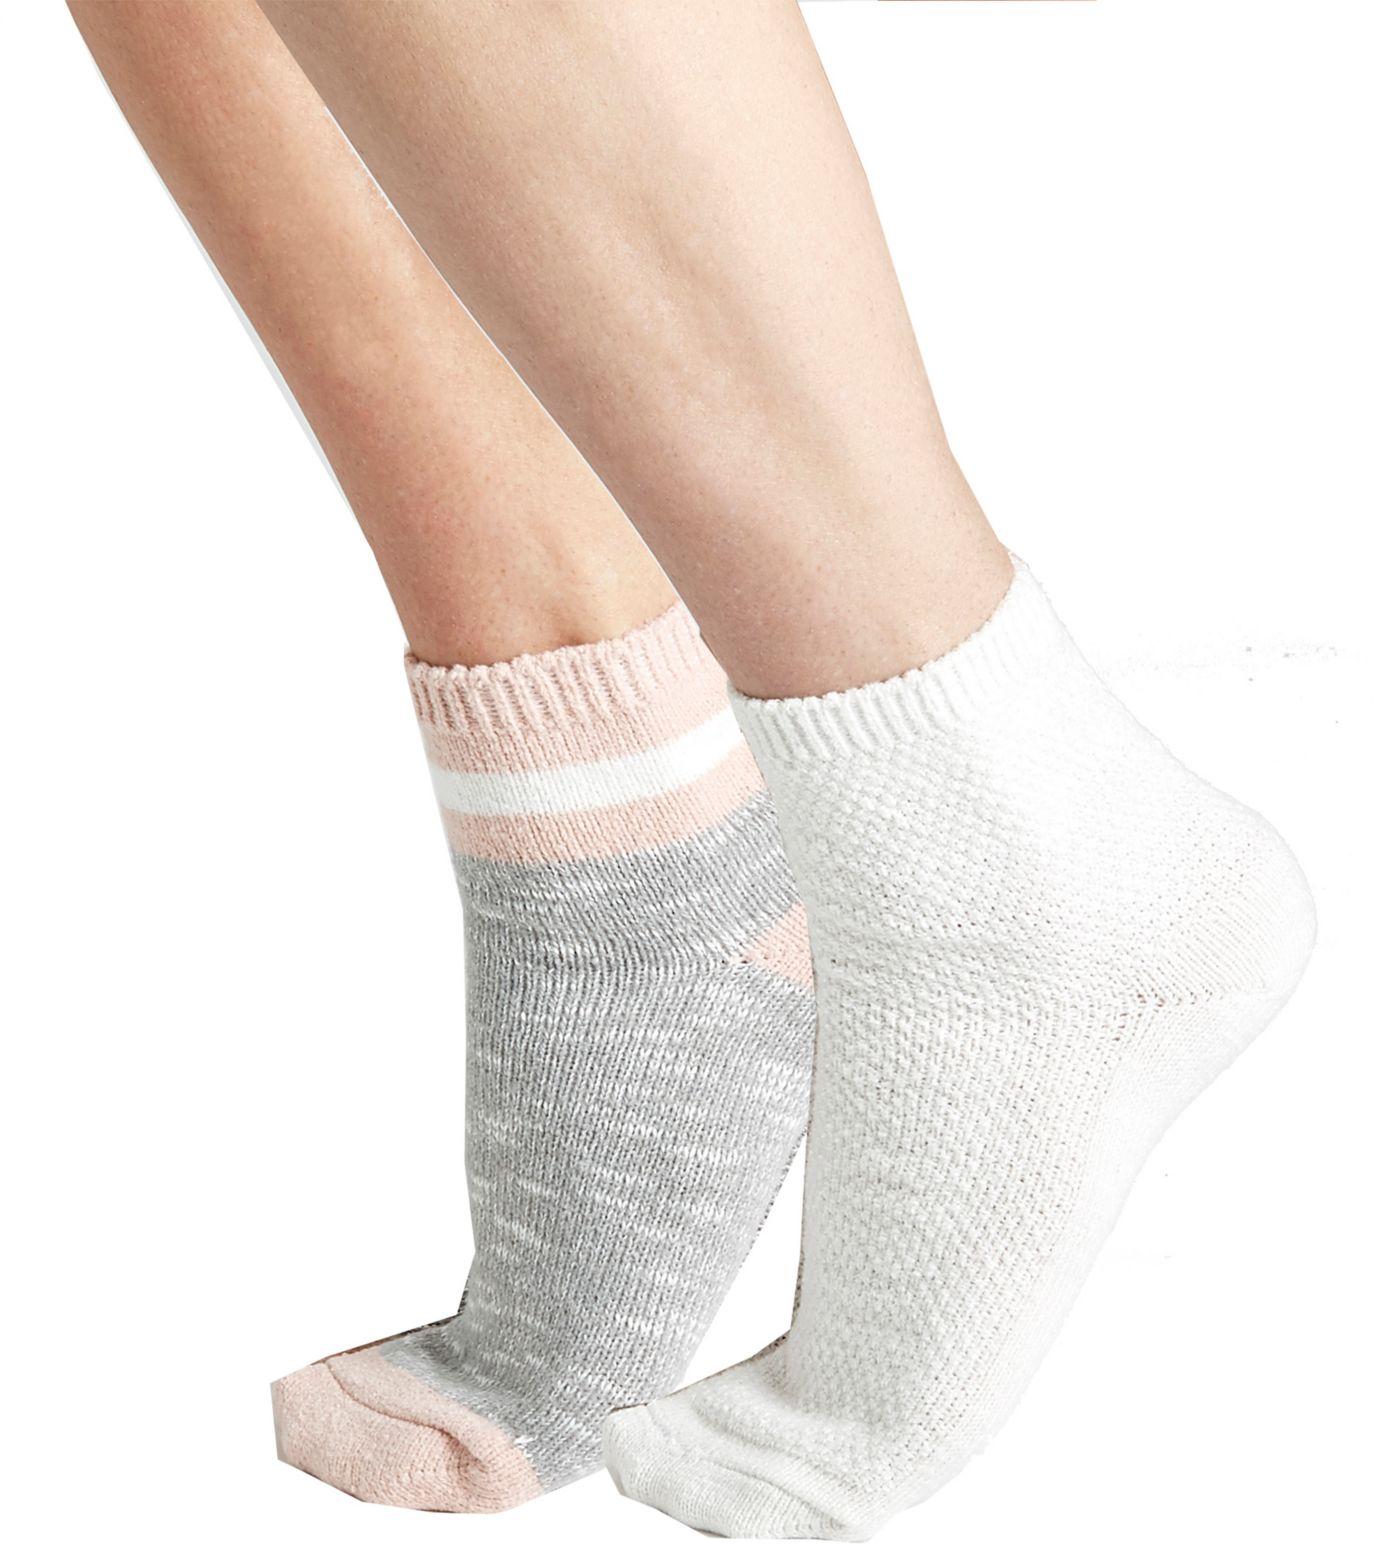 CALIA by Carrie Underwood Effortless Quarter Socks - 2 Pack